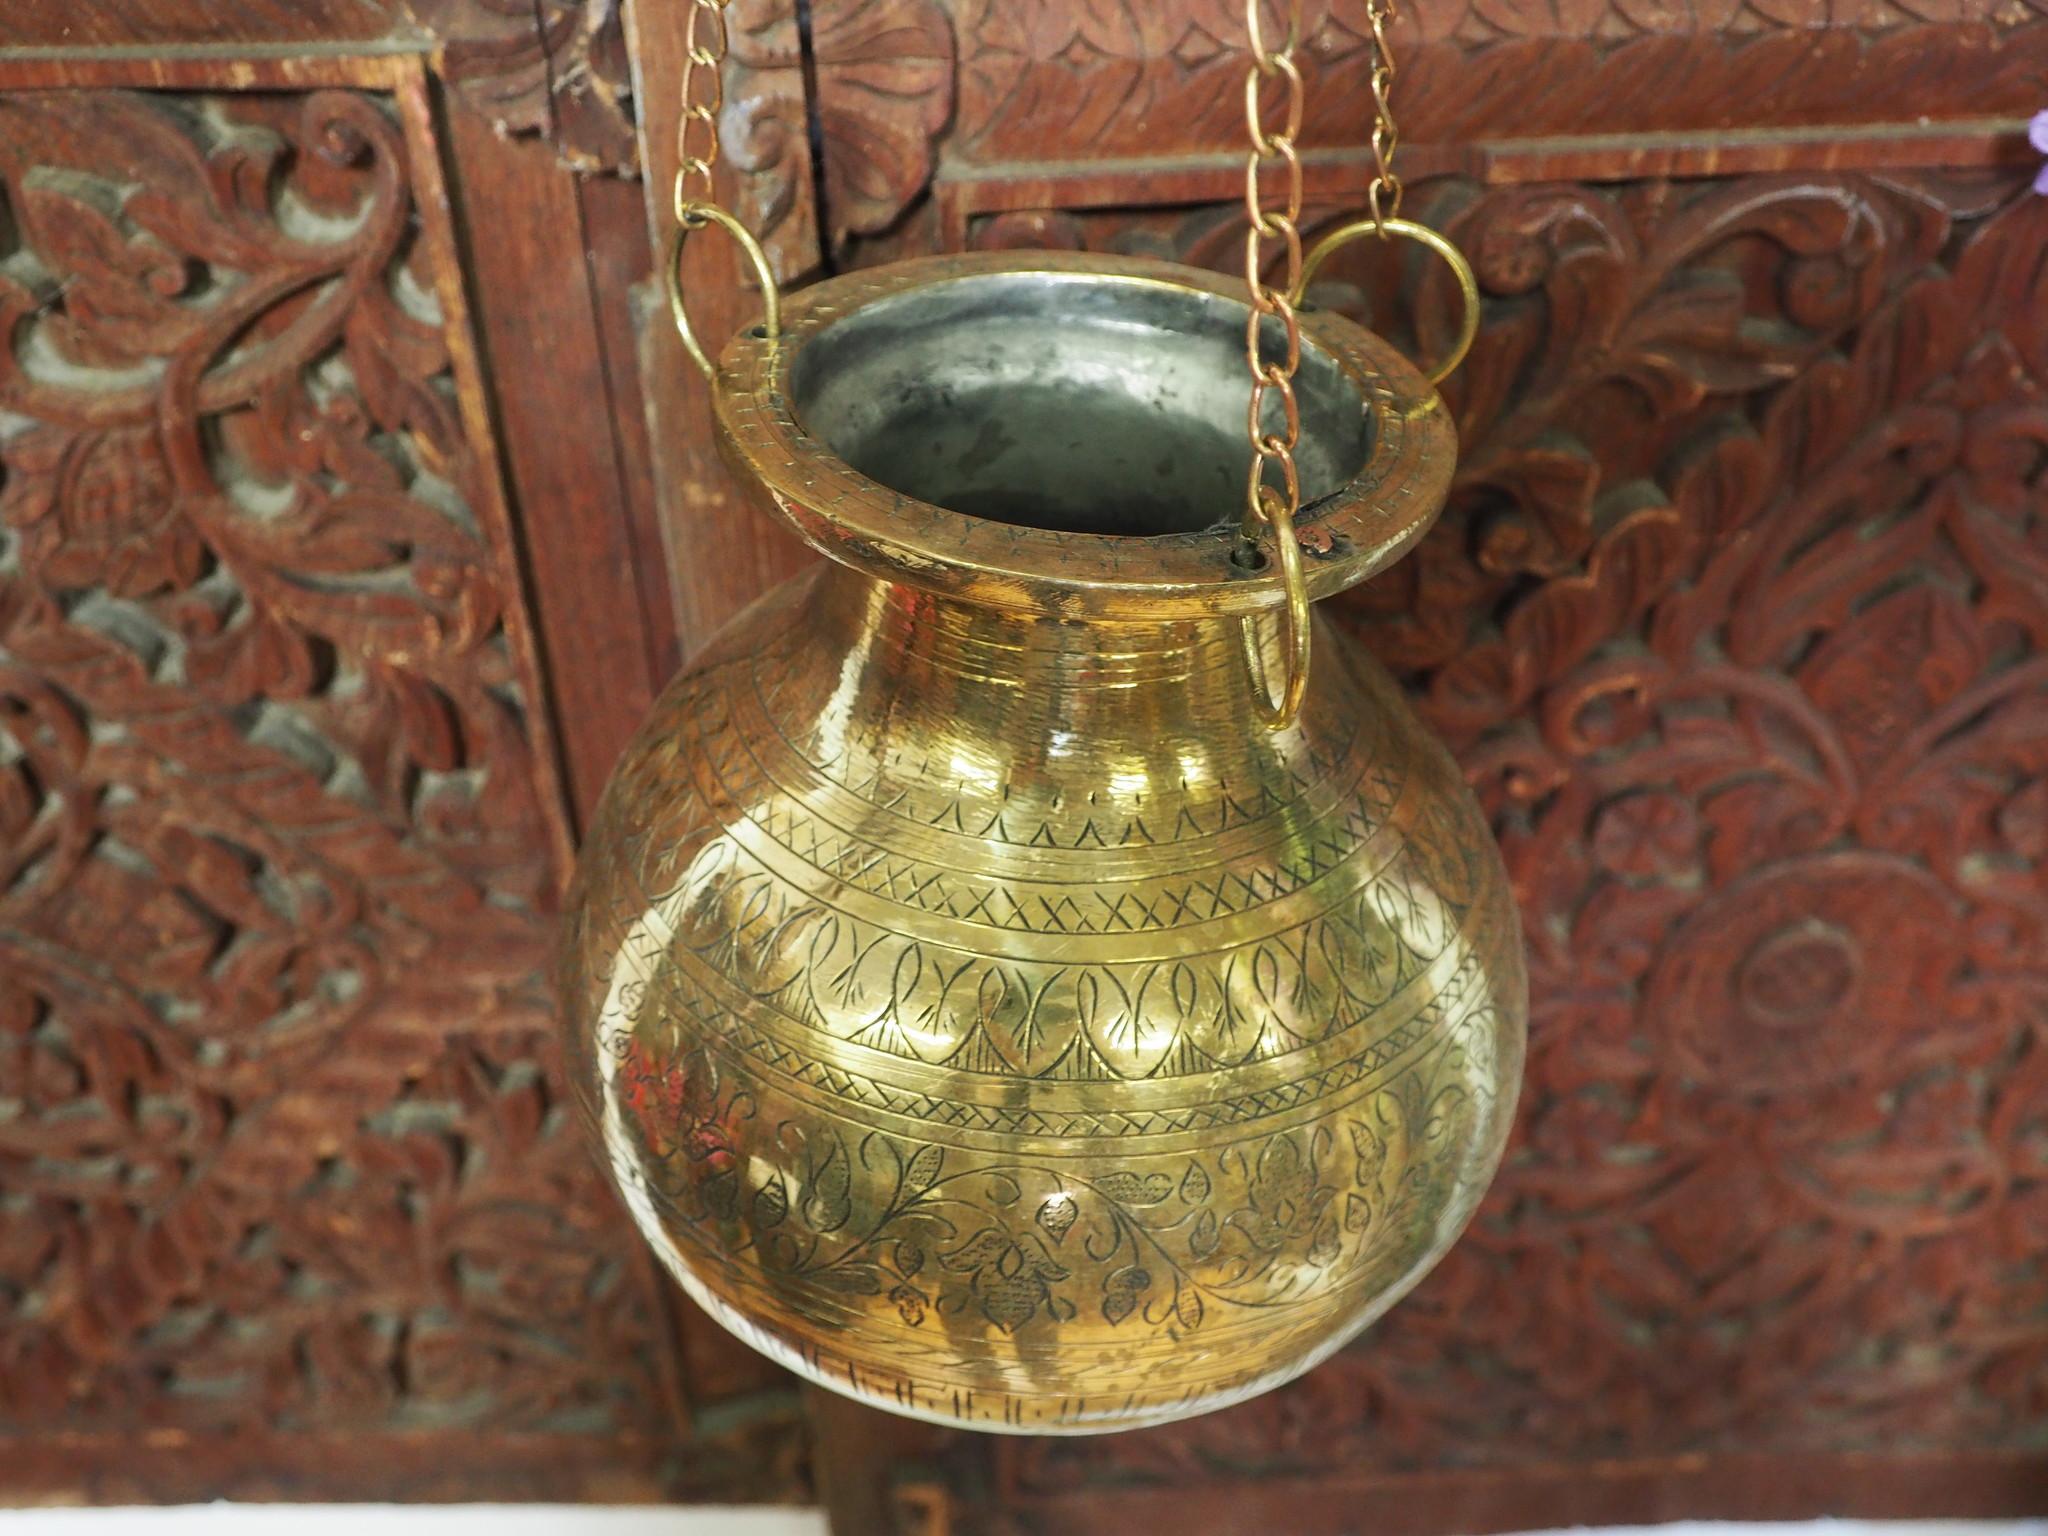 2,5 Liter antik orient Massiv Messing Ayurveda Shirodhara Stirnguss Stirnölguss öl-Therapie Panchakarma Yoga Dhara Vessel gefäß -Nr: 21/2